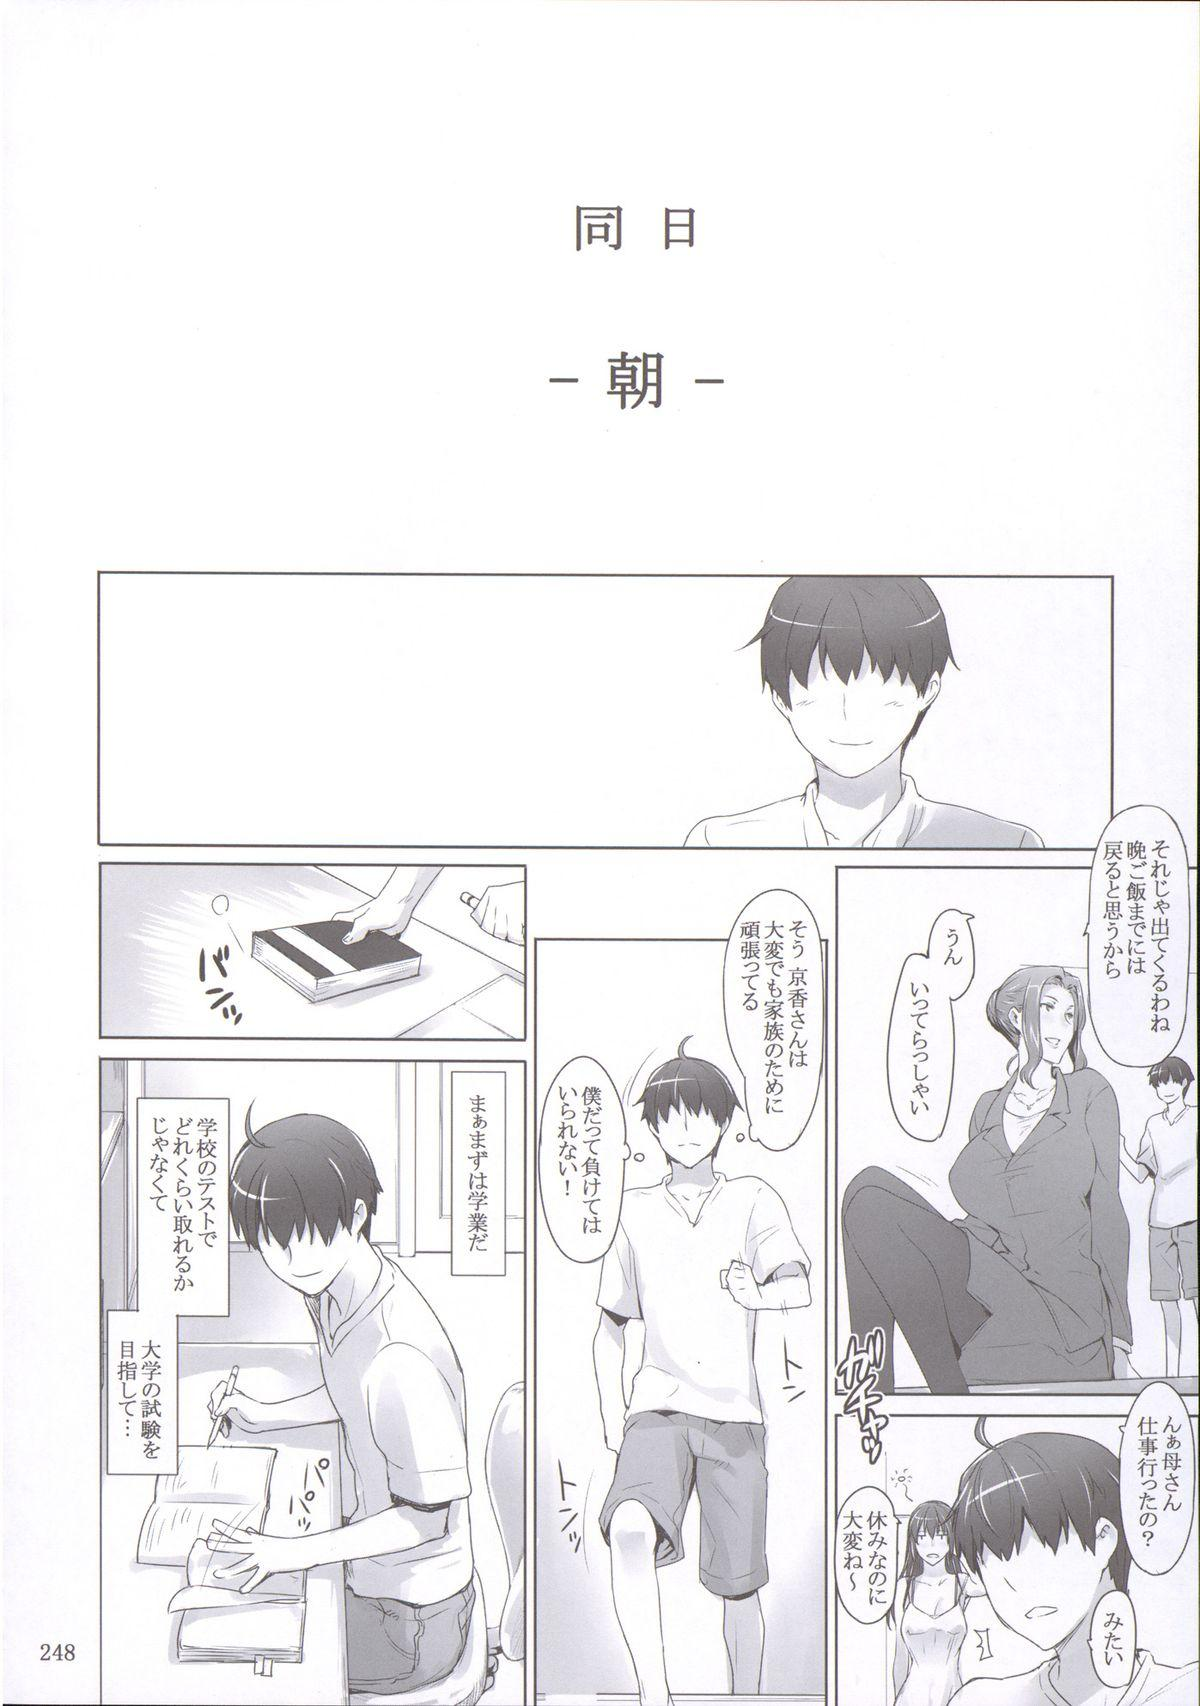 (C86) [MTSP (Jin)] Tachibana-san-chi no Dansei Jijou Matome Ban [Incomplete] 46